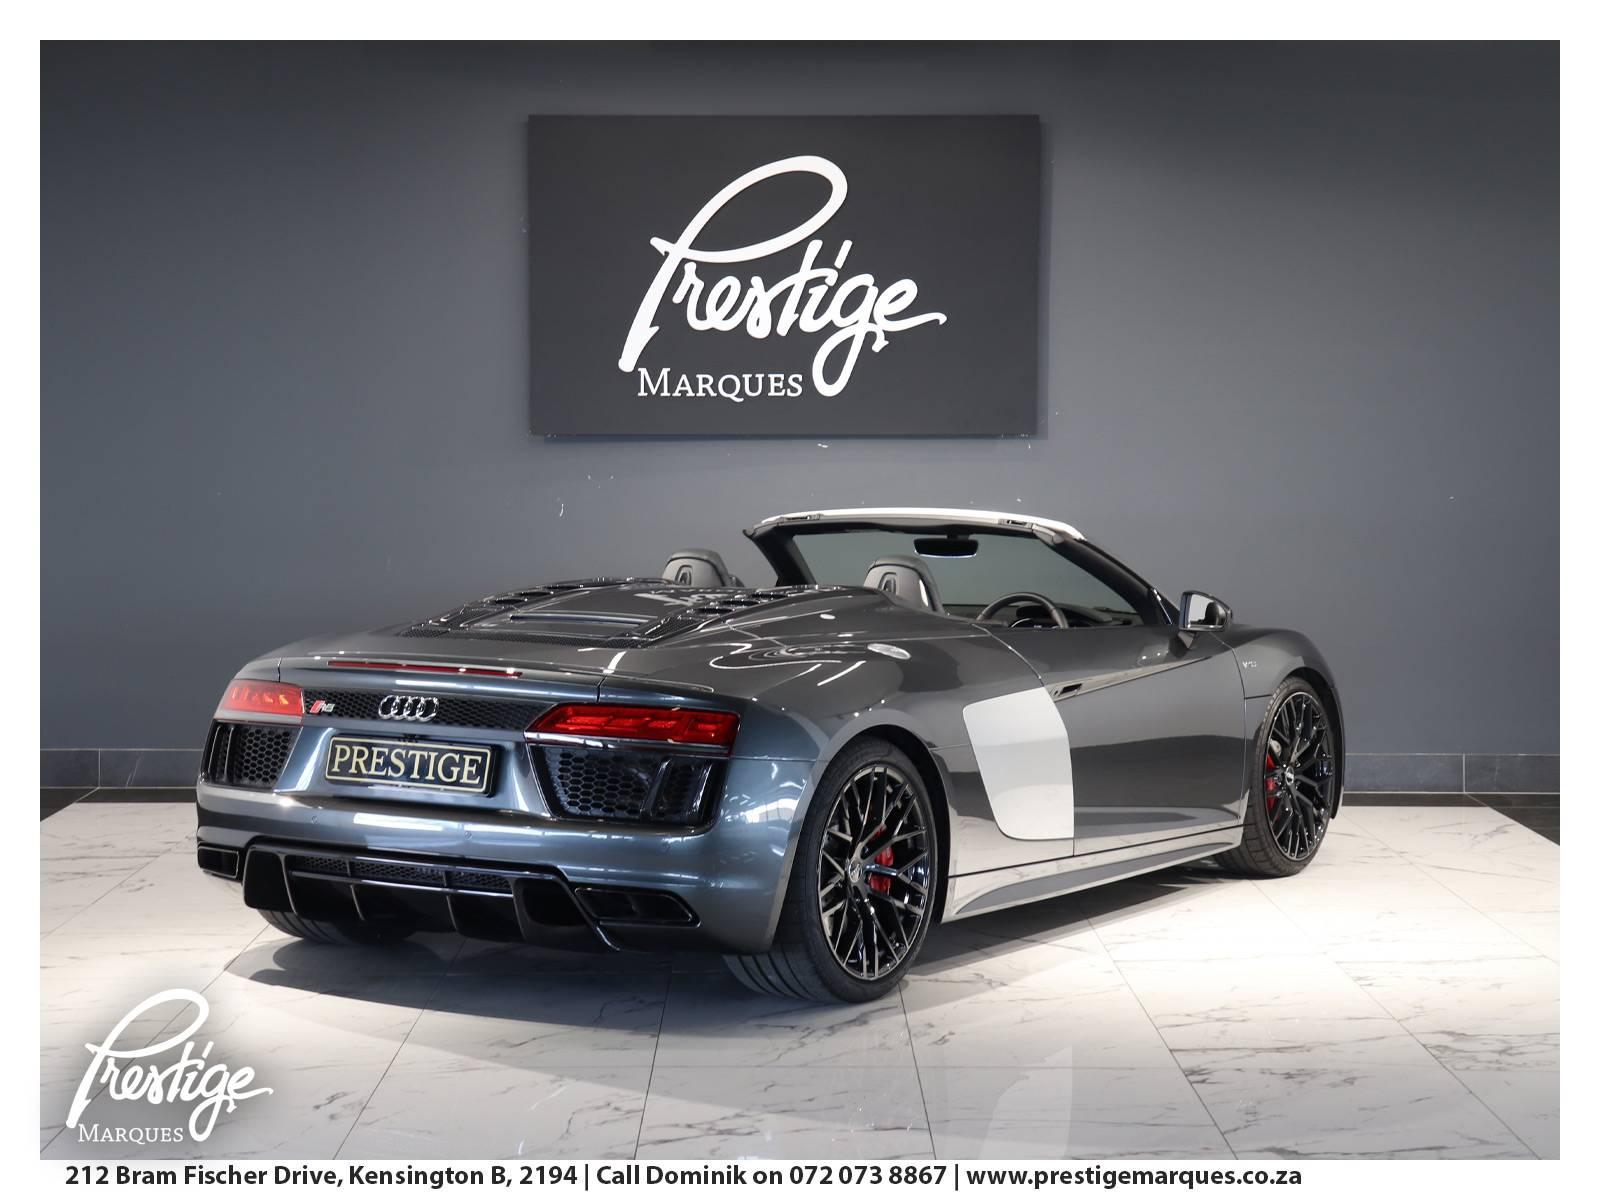 2019-Audi-R8-Prestige-Marques-Randburg-Sandton-6